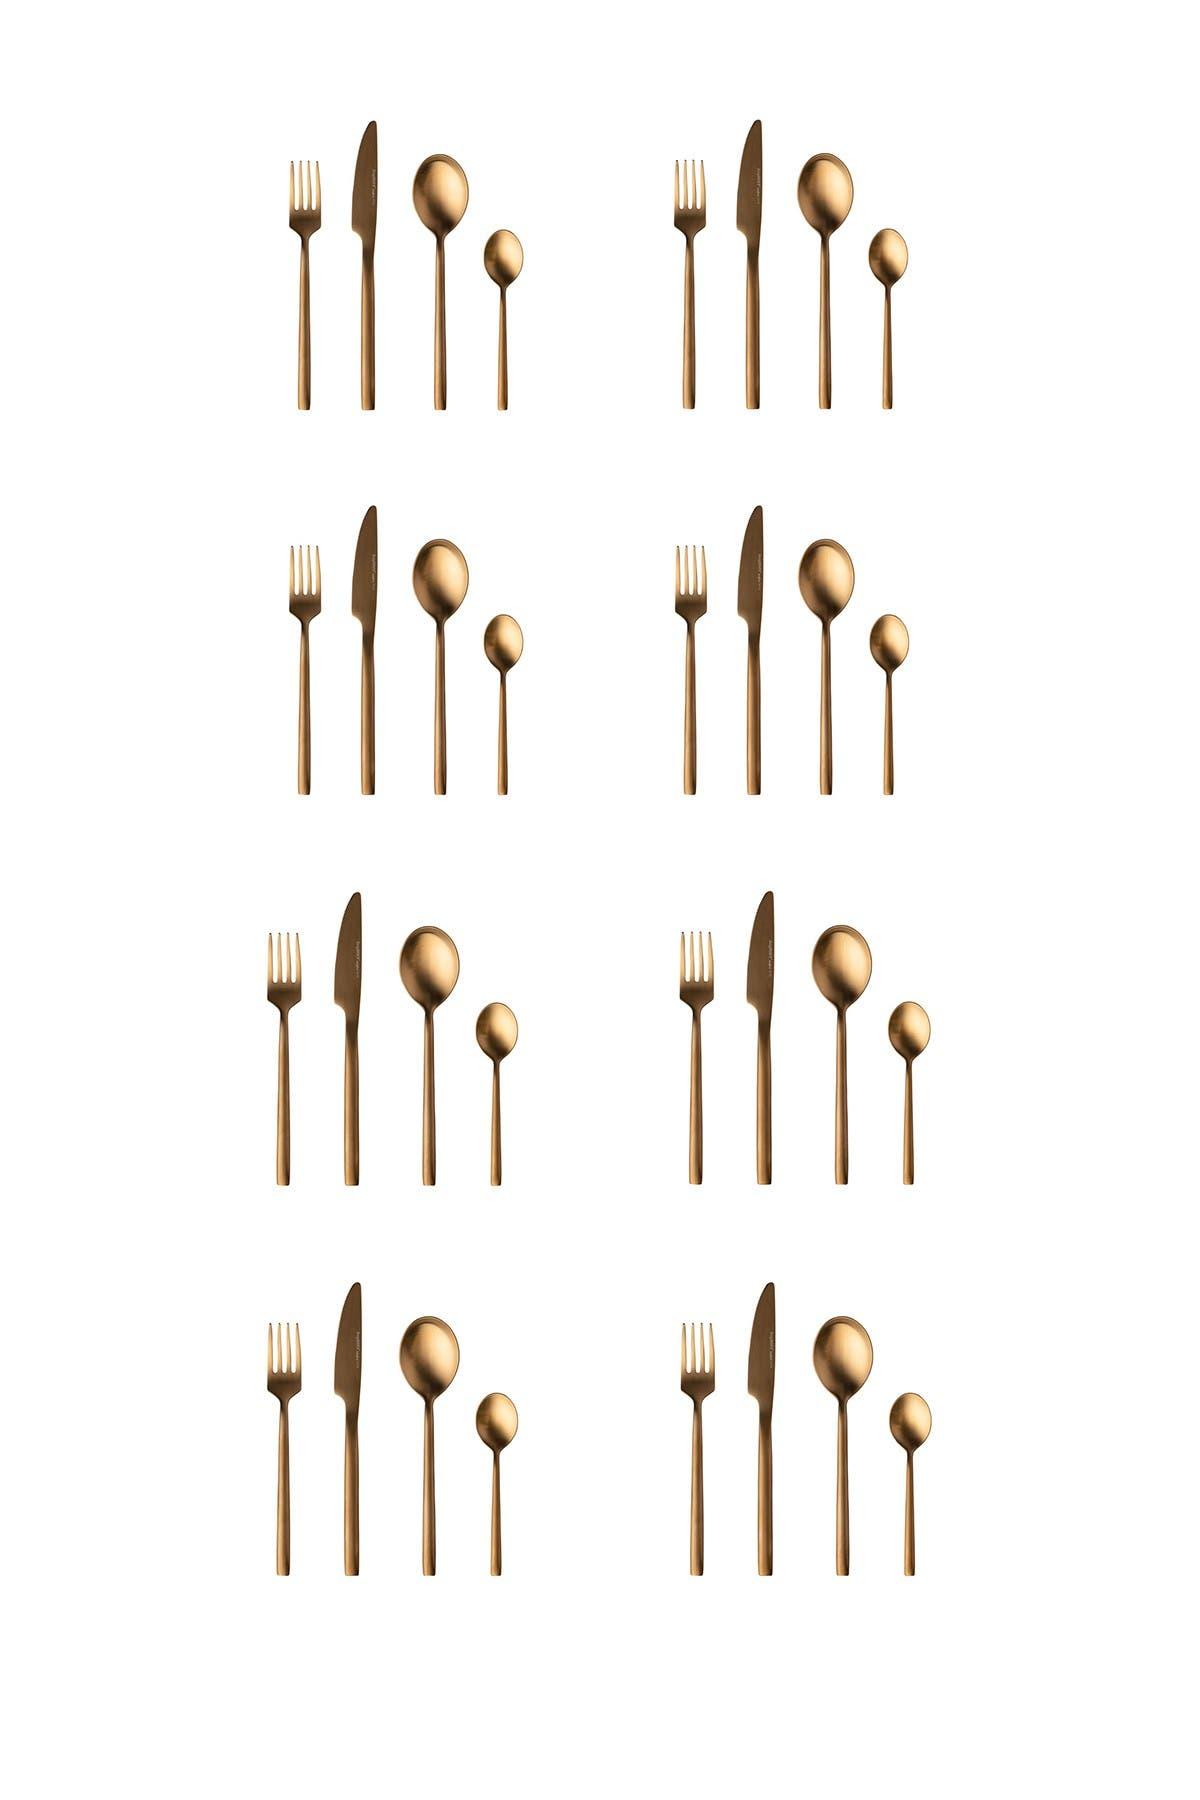 Image of BergHOFF Gem 32-Piece Gold Plated Flatware Set